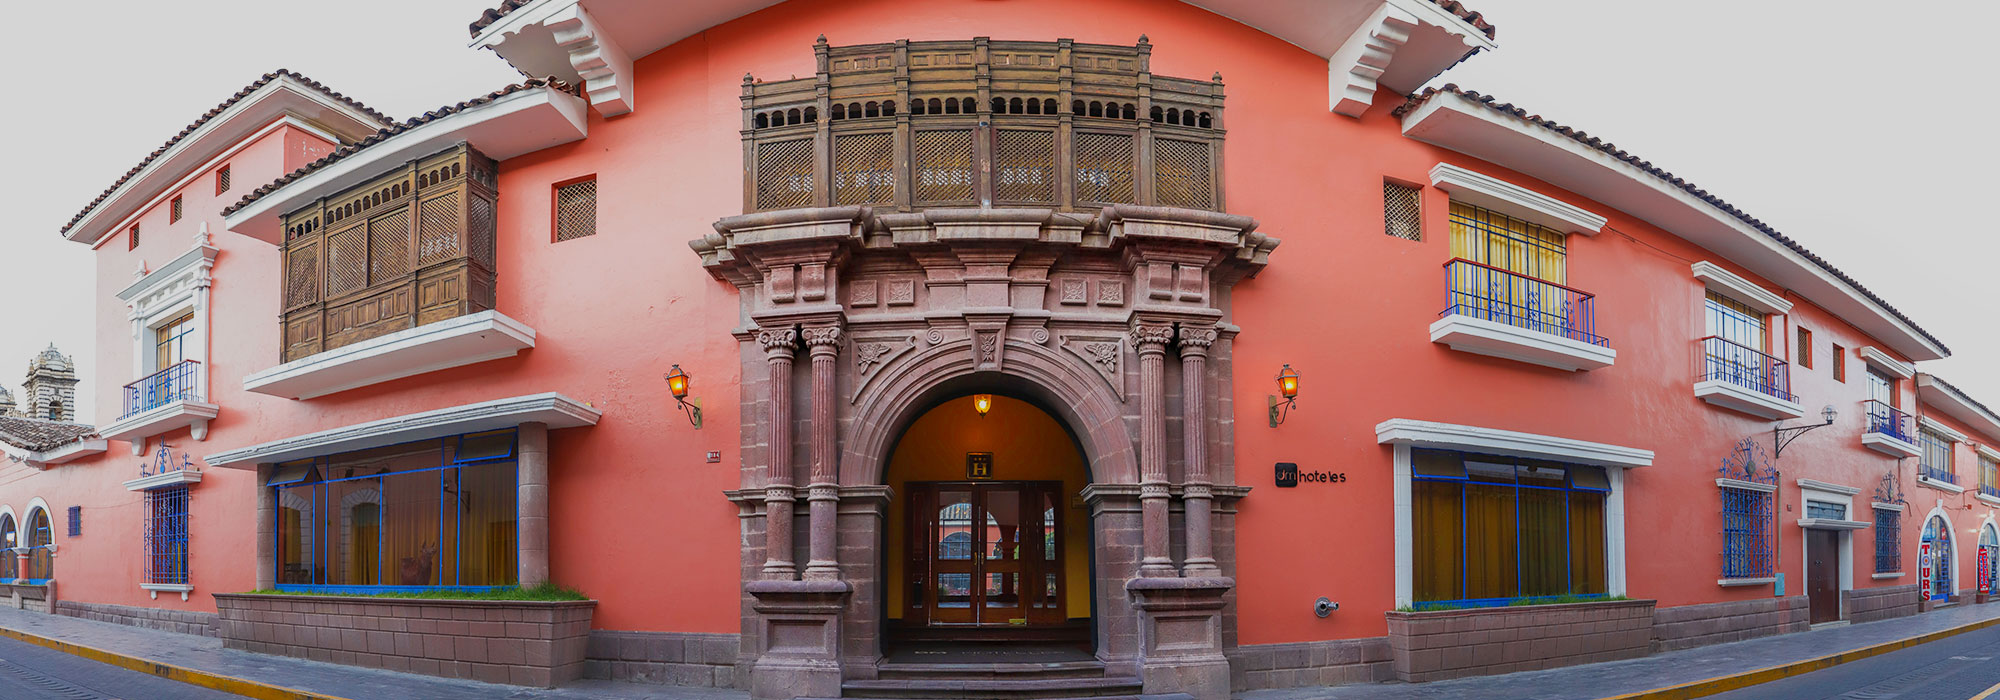 dm-hoteles-peru-ayacucho-banner-home